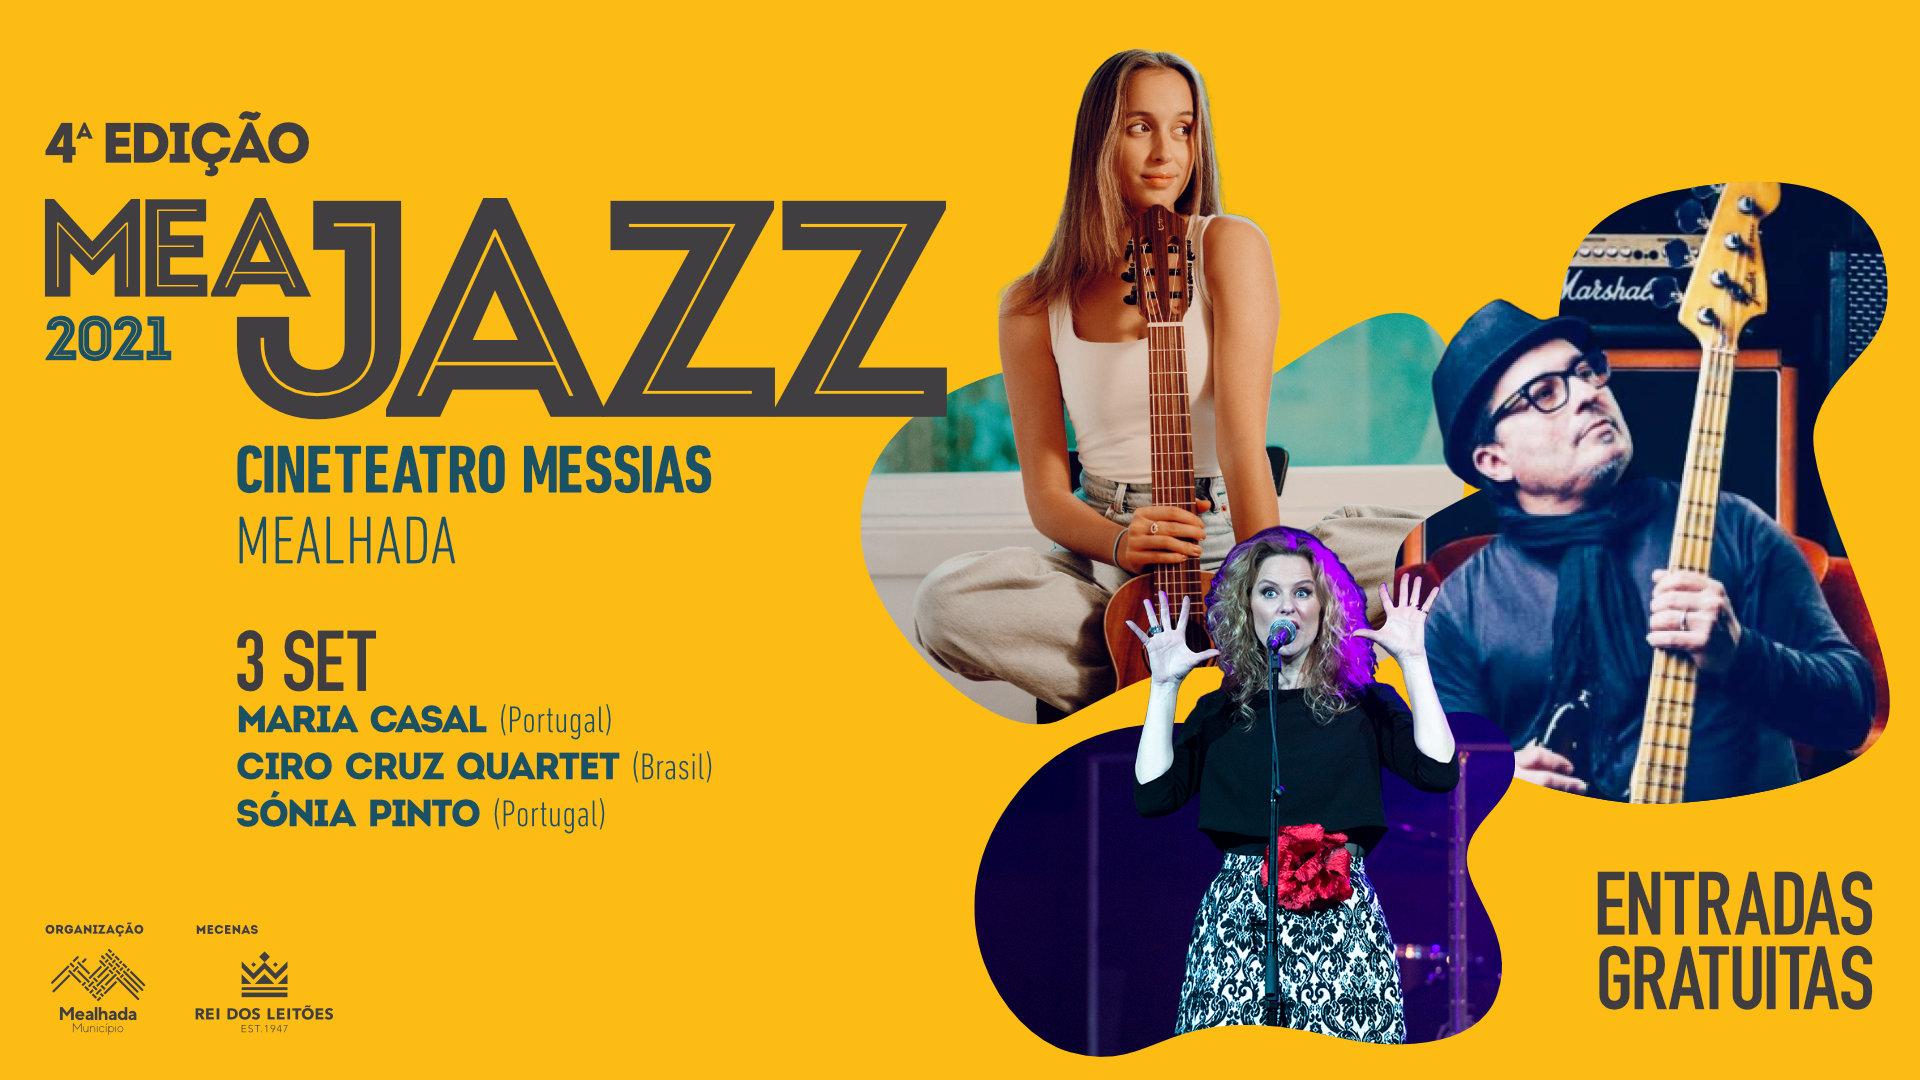 Meajazz - 4.ª edição: Maria Casal (Portugal)